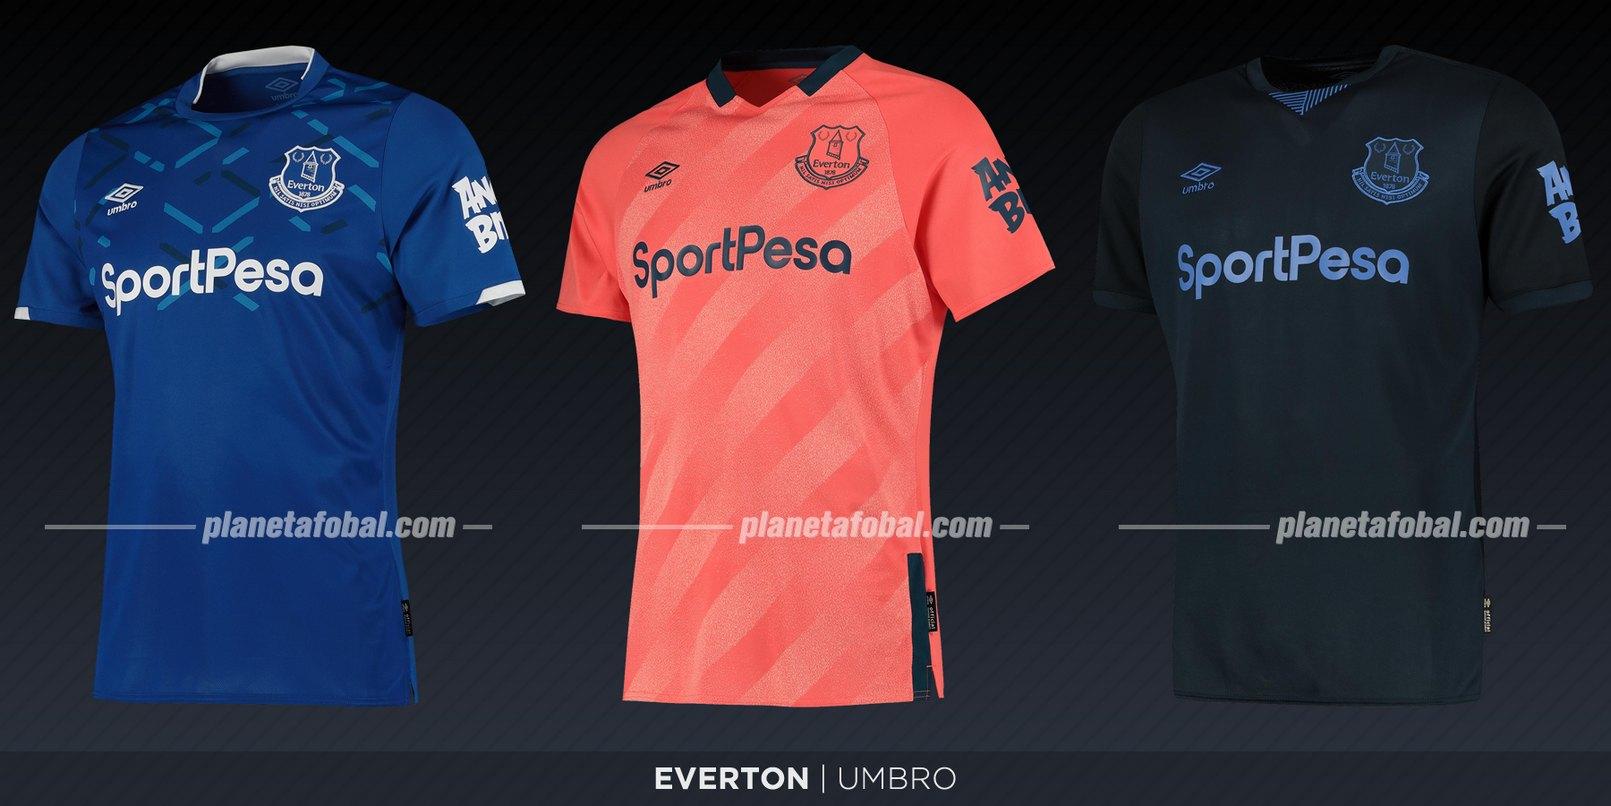 Evrton (Umbro) | Camisetas de la Premier League 2019-2020